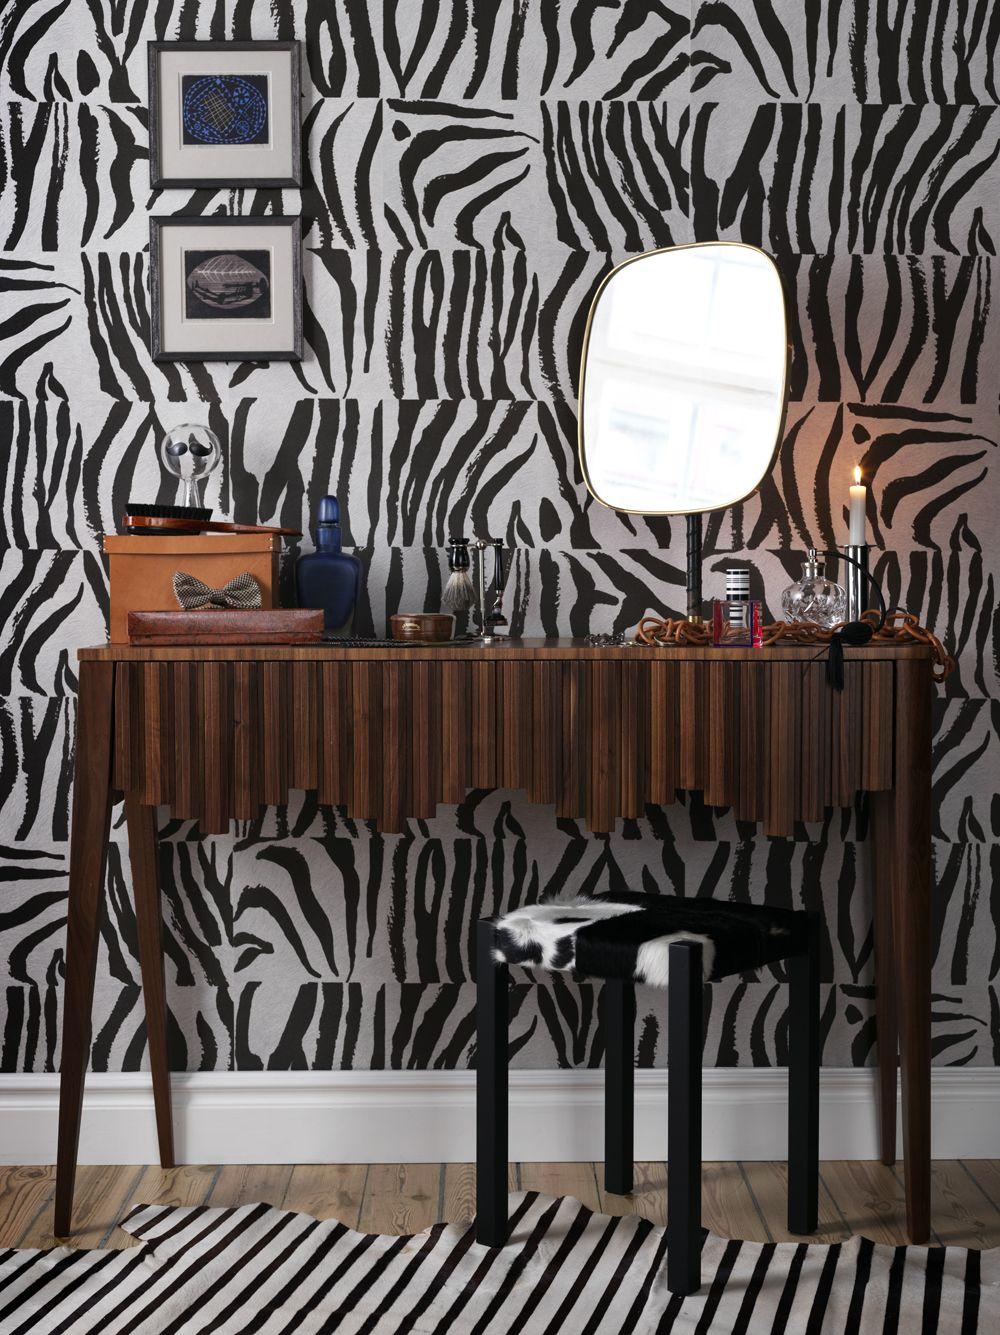 Pattern Number: X7IRPE69D | Zebra wallpaper, Zebra print ...